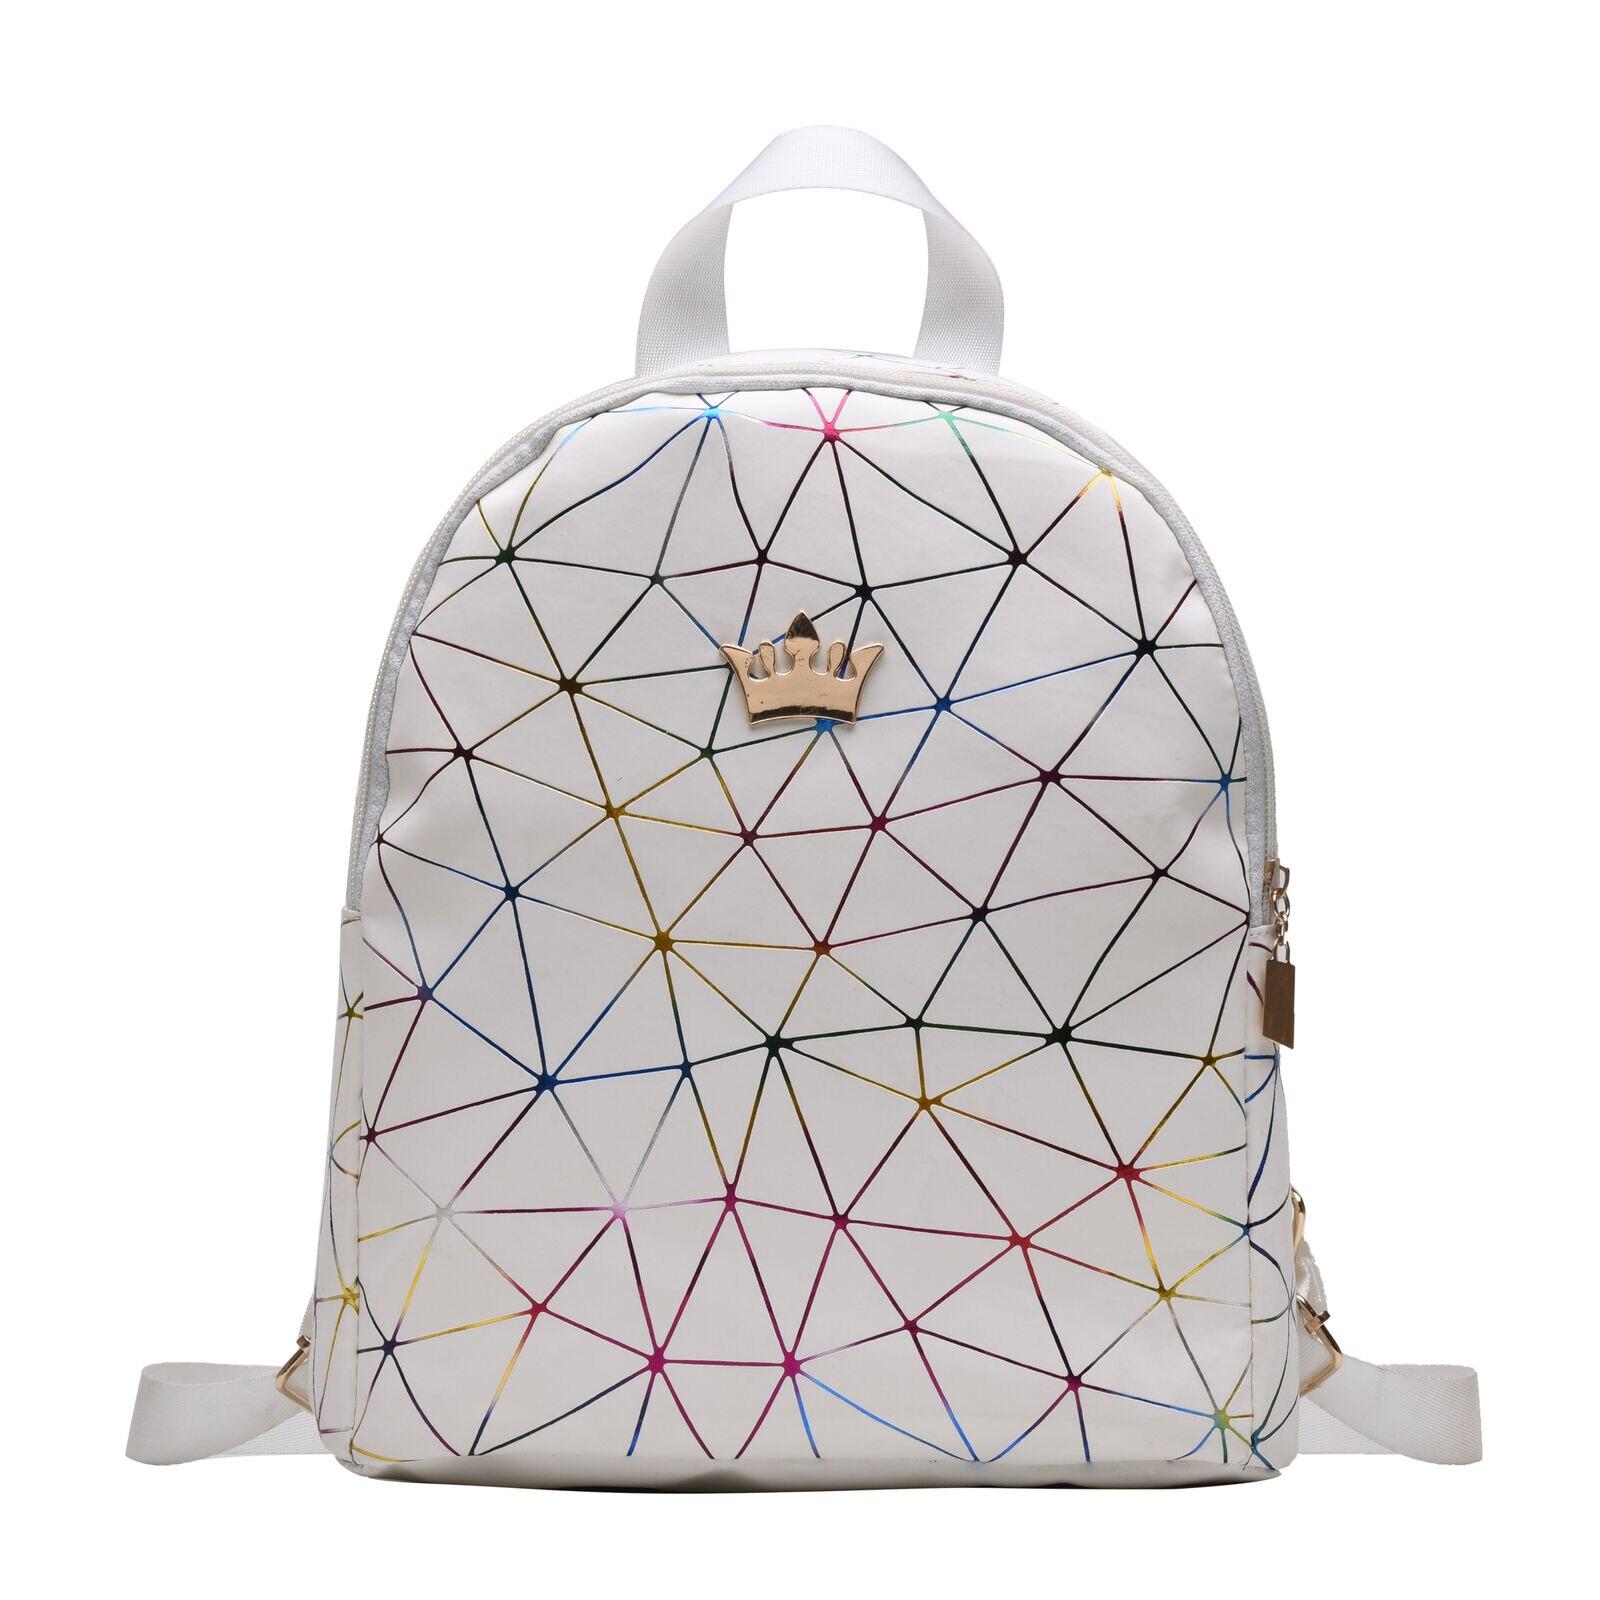 Women Mini Backpack PU Leather Shoulder School Rucksack Ladies Girls Bagpack Bags Travel Bag Women Hot Wild Geometric Backpack